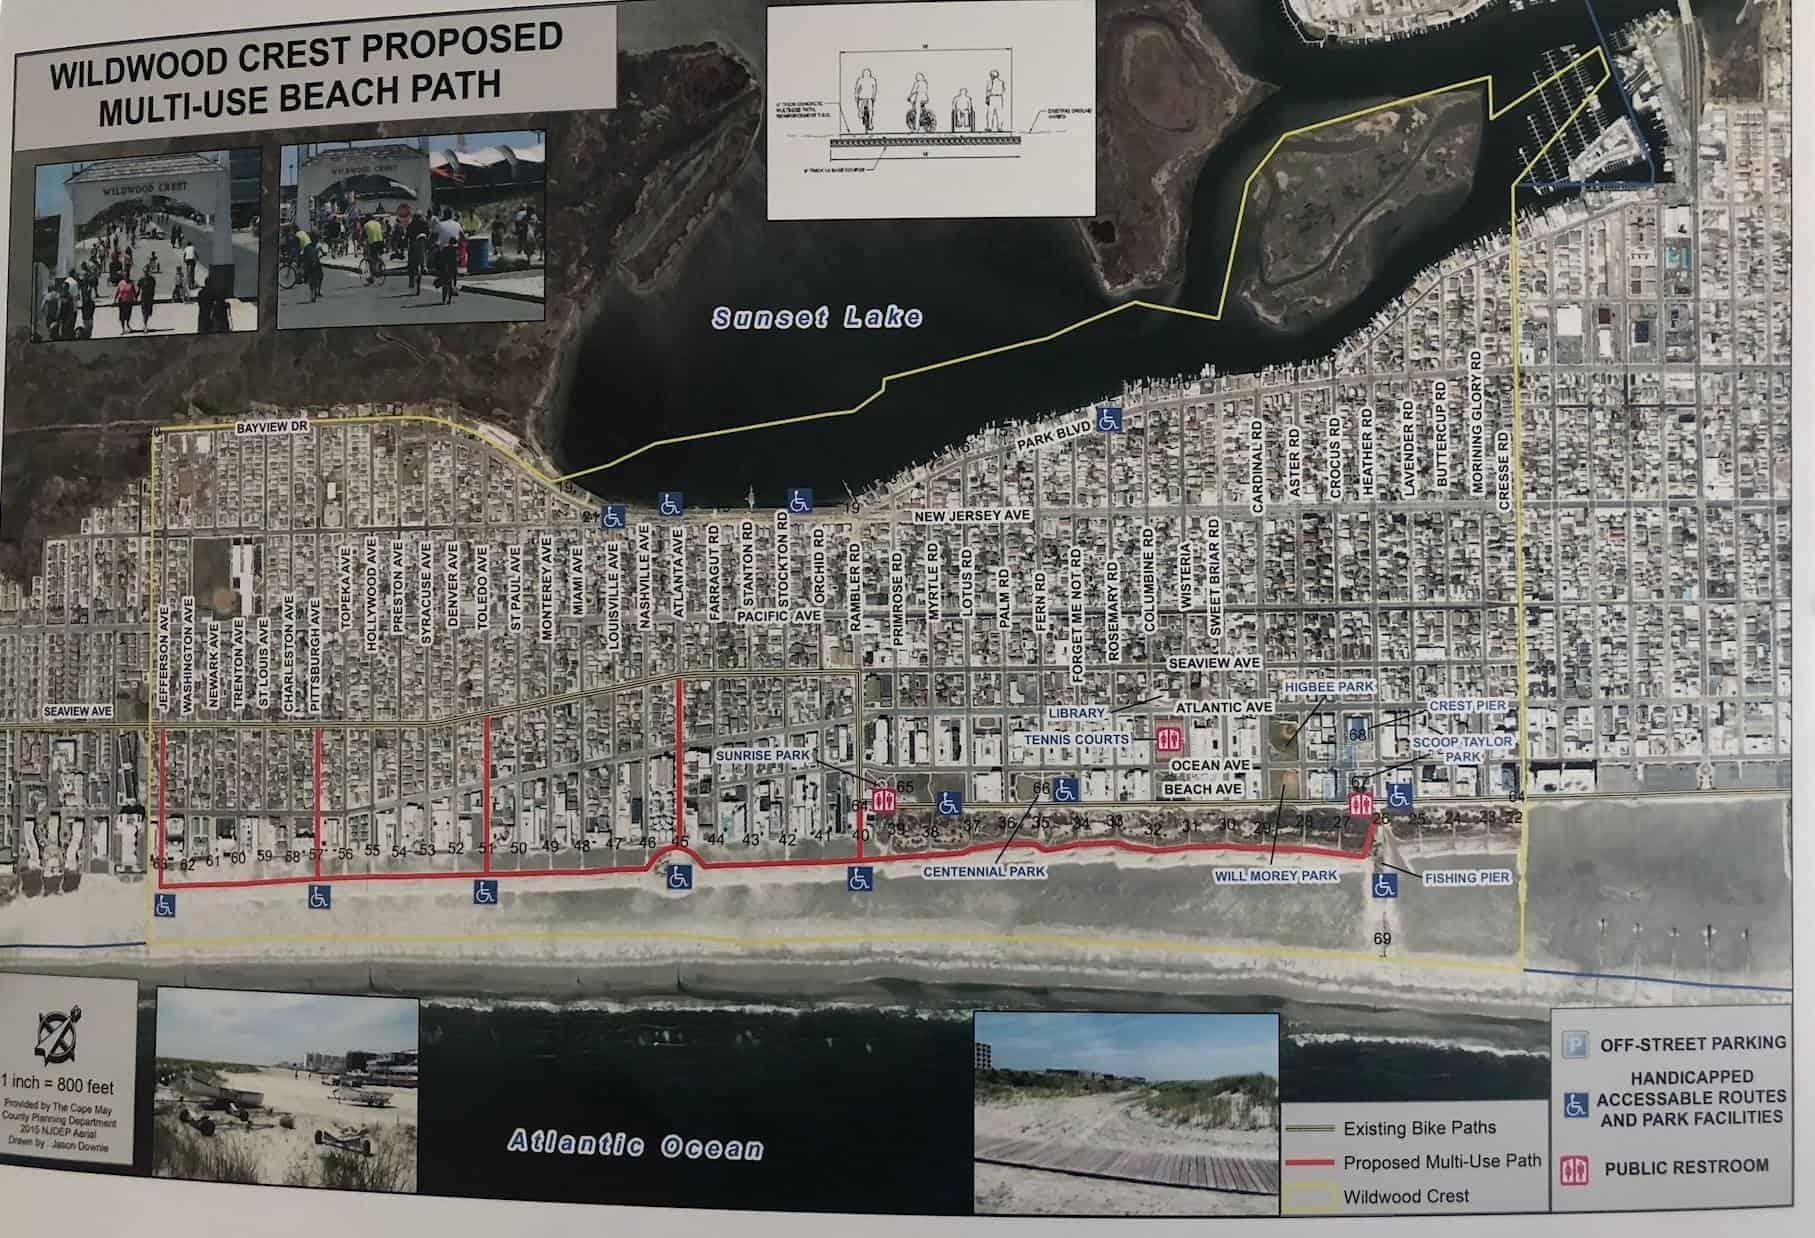 NEW Proposed Multi-Use Beach Path!